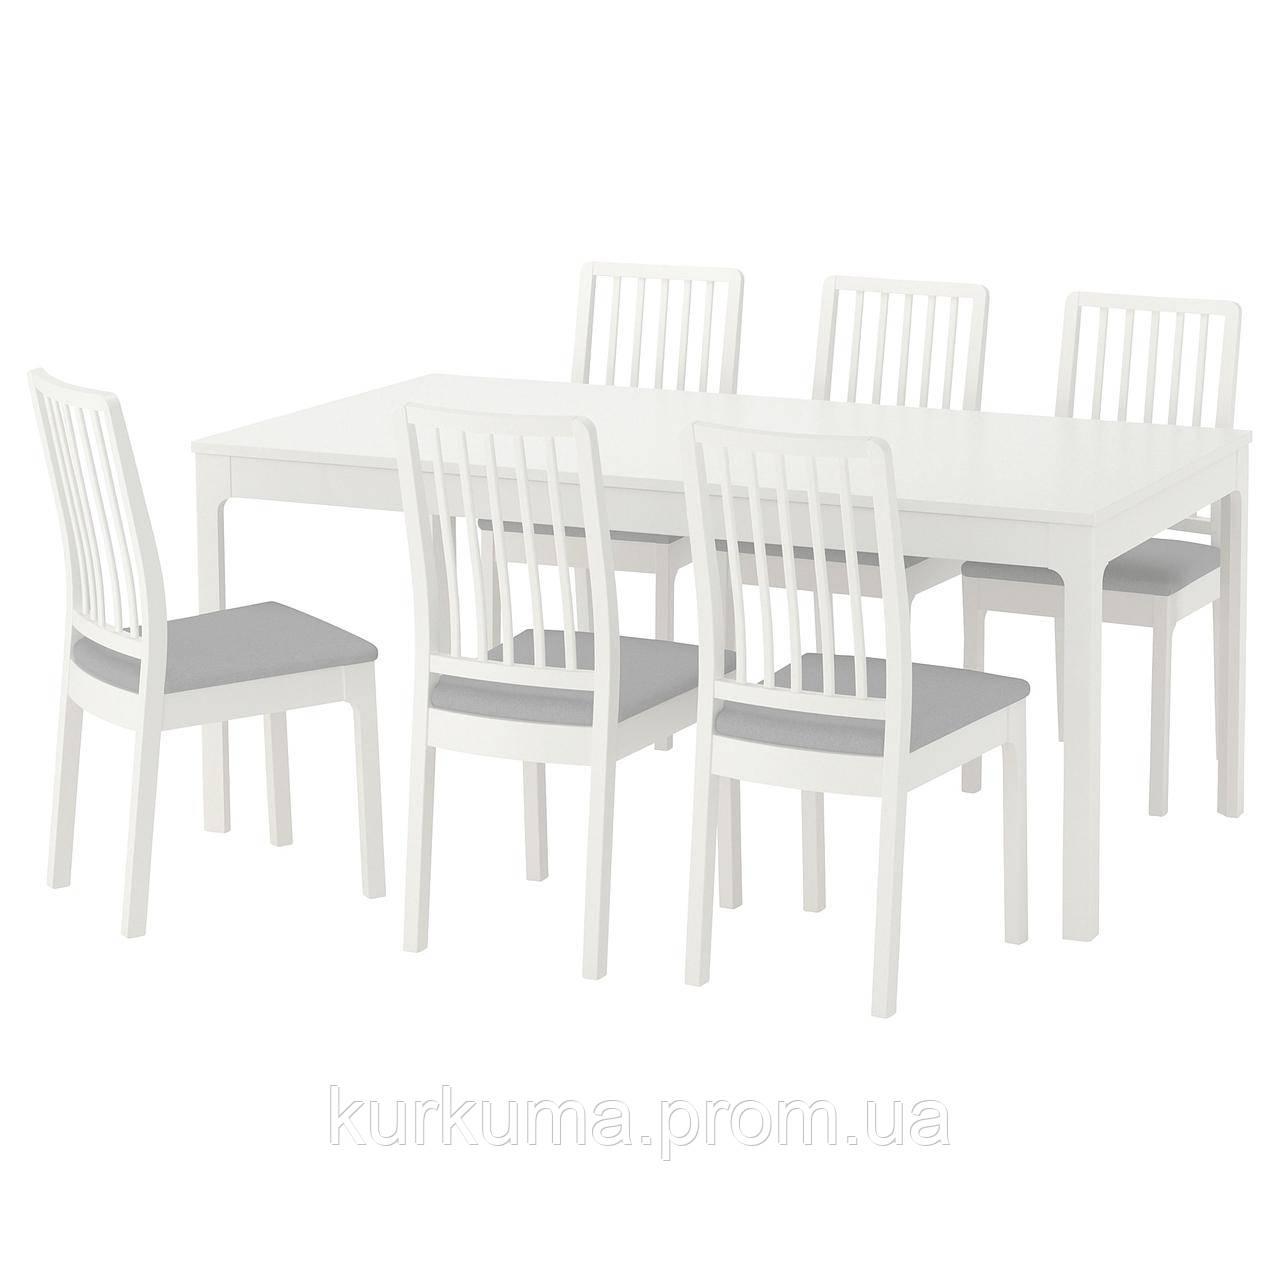 IKEA EKEDALEN/EKEDALEN Стол и 6 стульев, белый, Оррста светло-серый  (192.213.51)